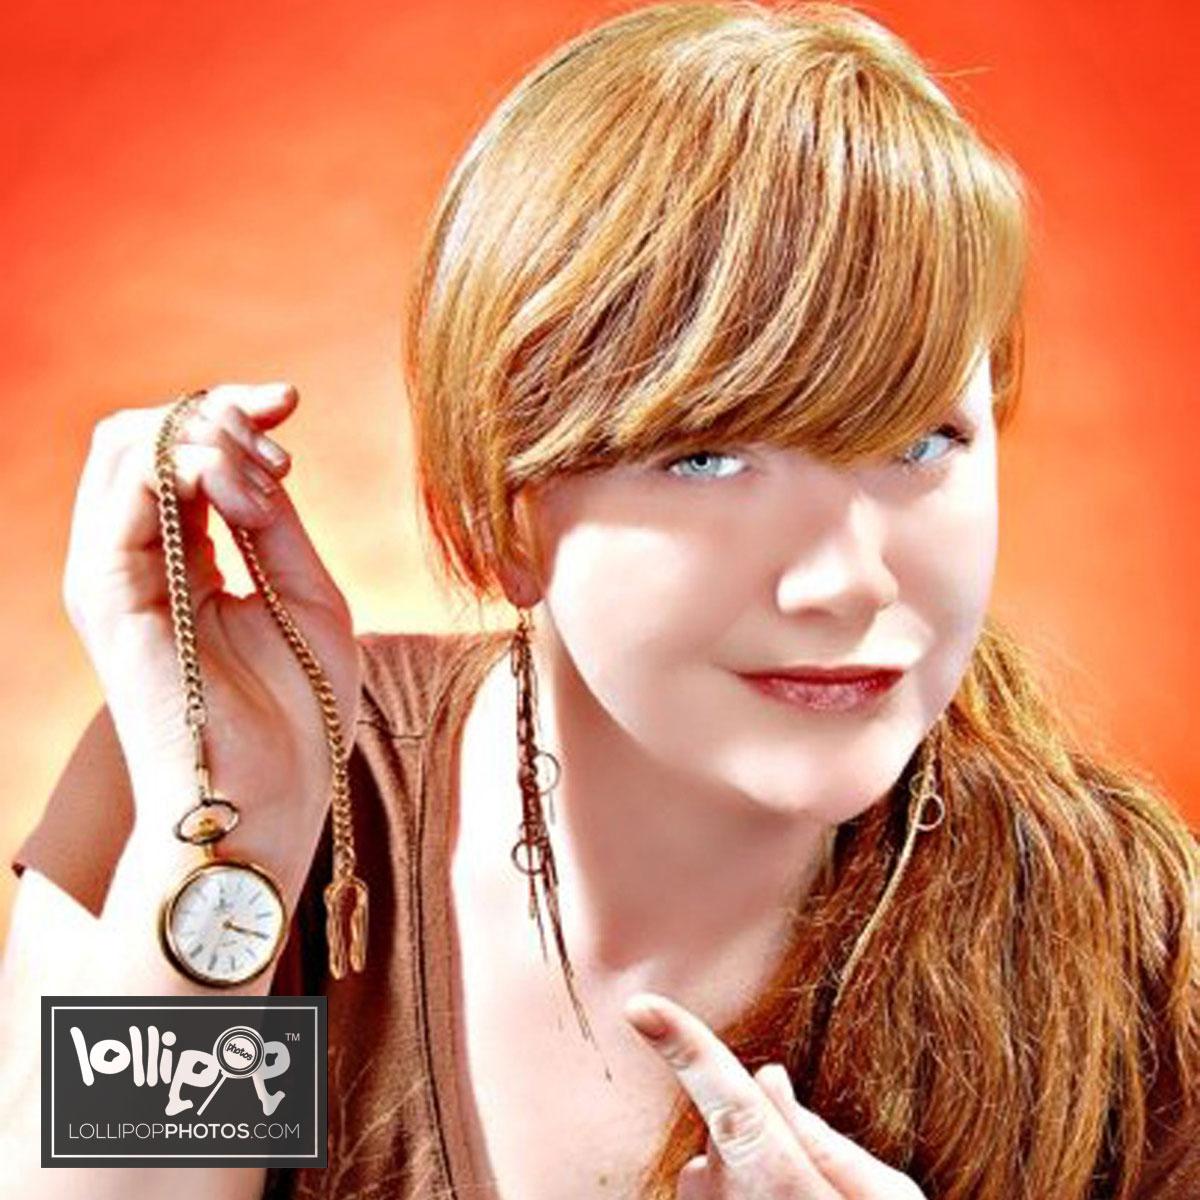 msdig-nora-canfield-lollipop-photos-141.jpg